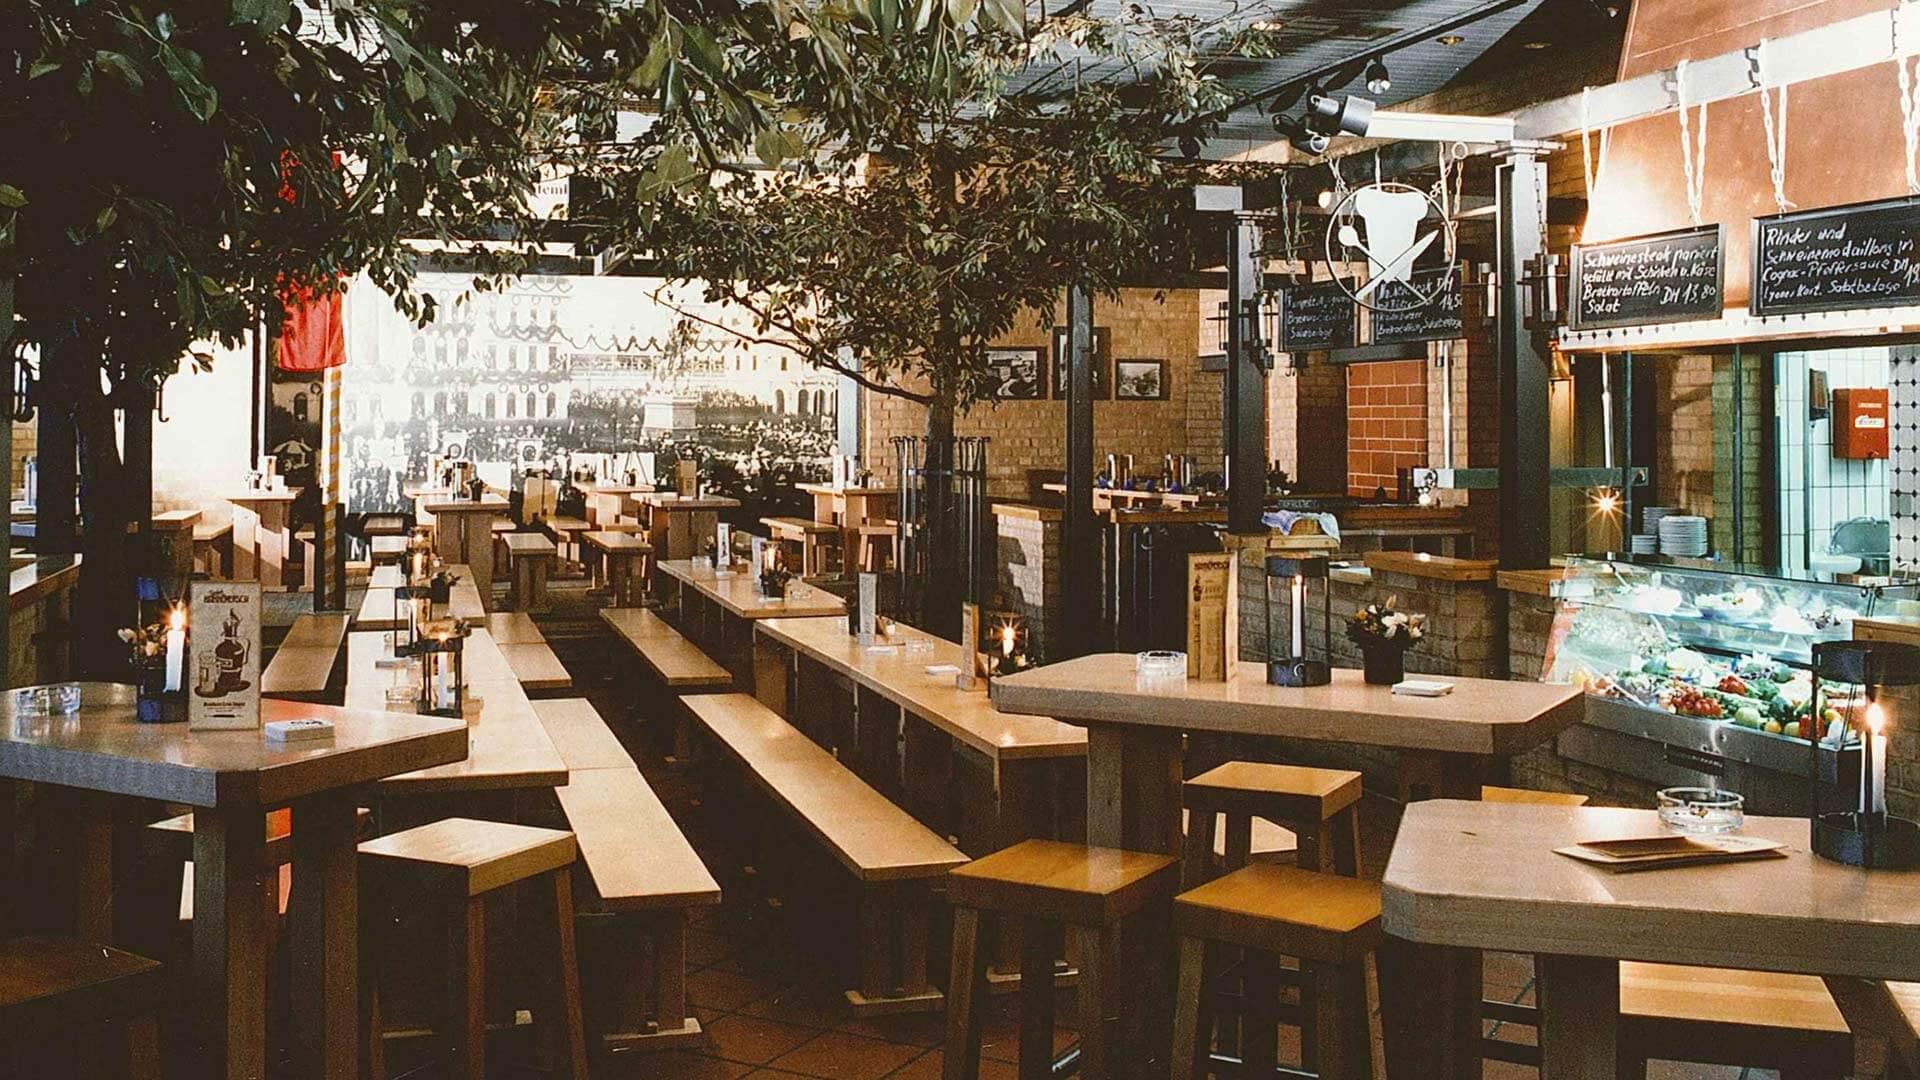 Brauhaus Gastraum 1986